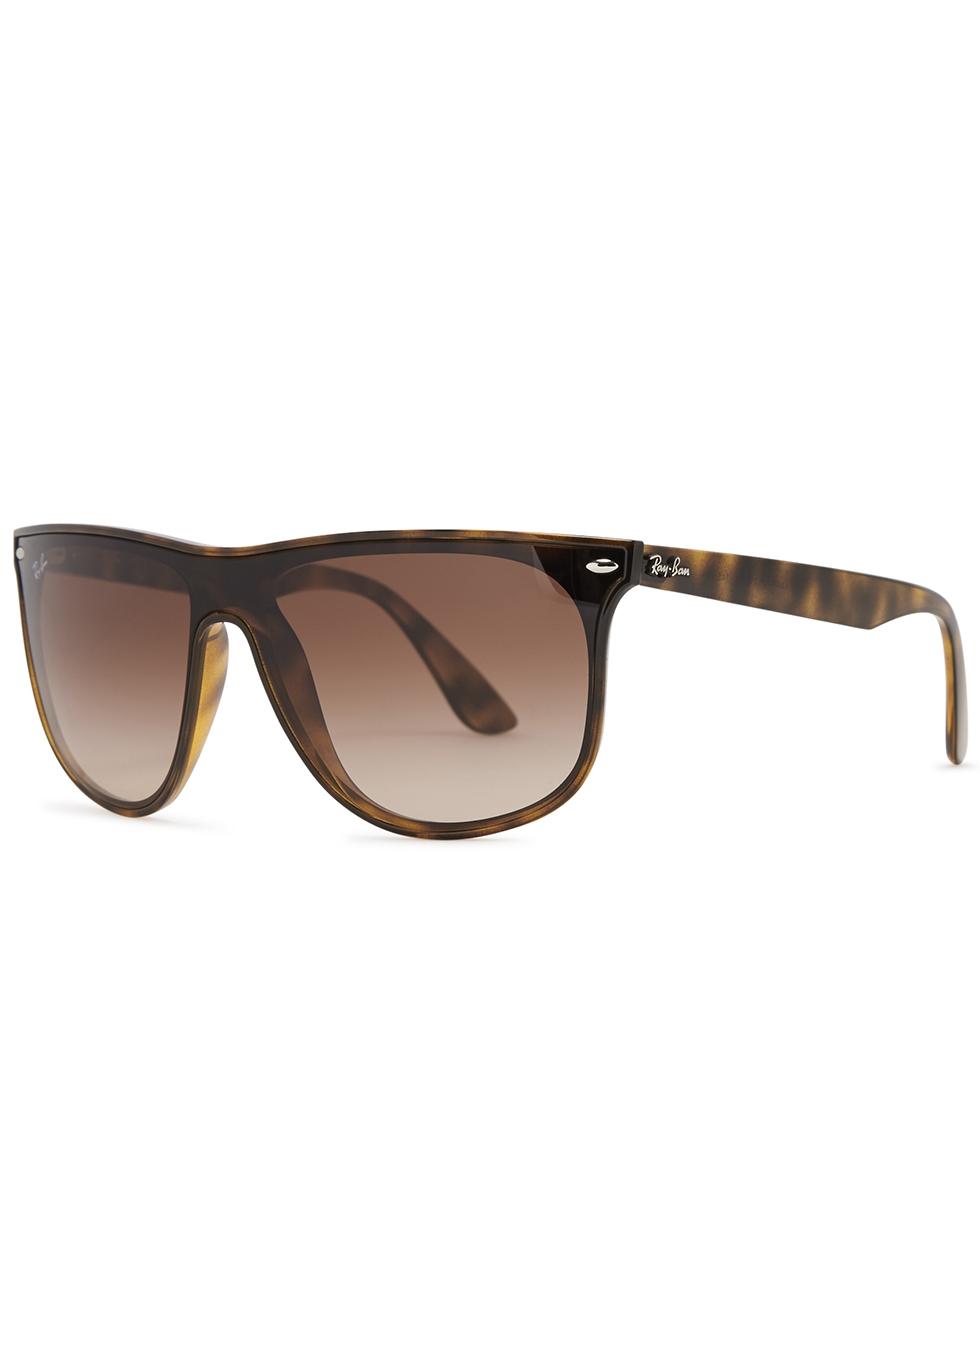 Tortoiseshell D-frame sunglasses - Ray-Ban